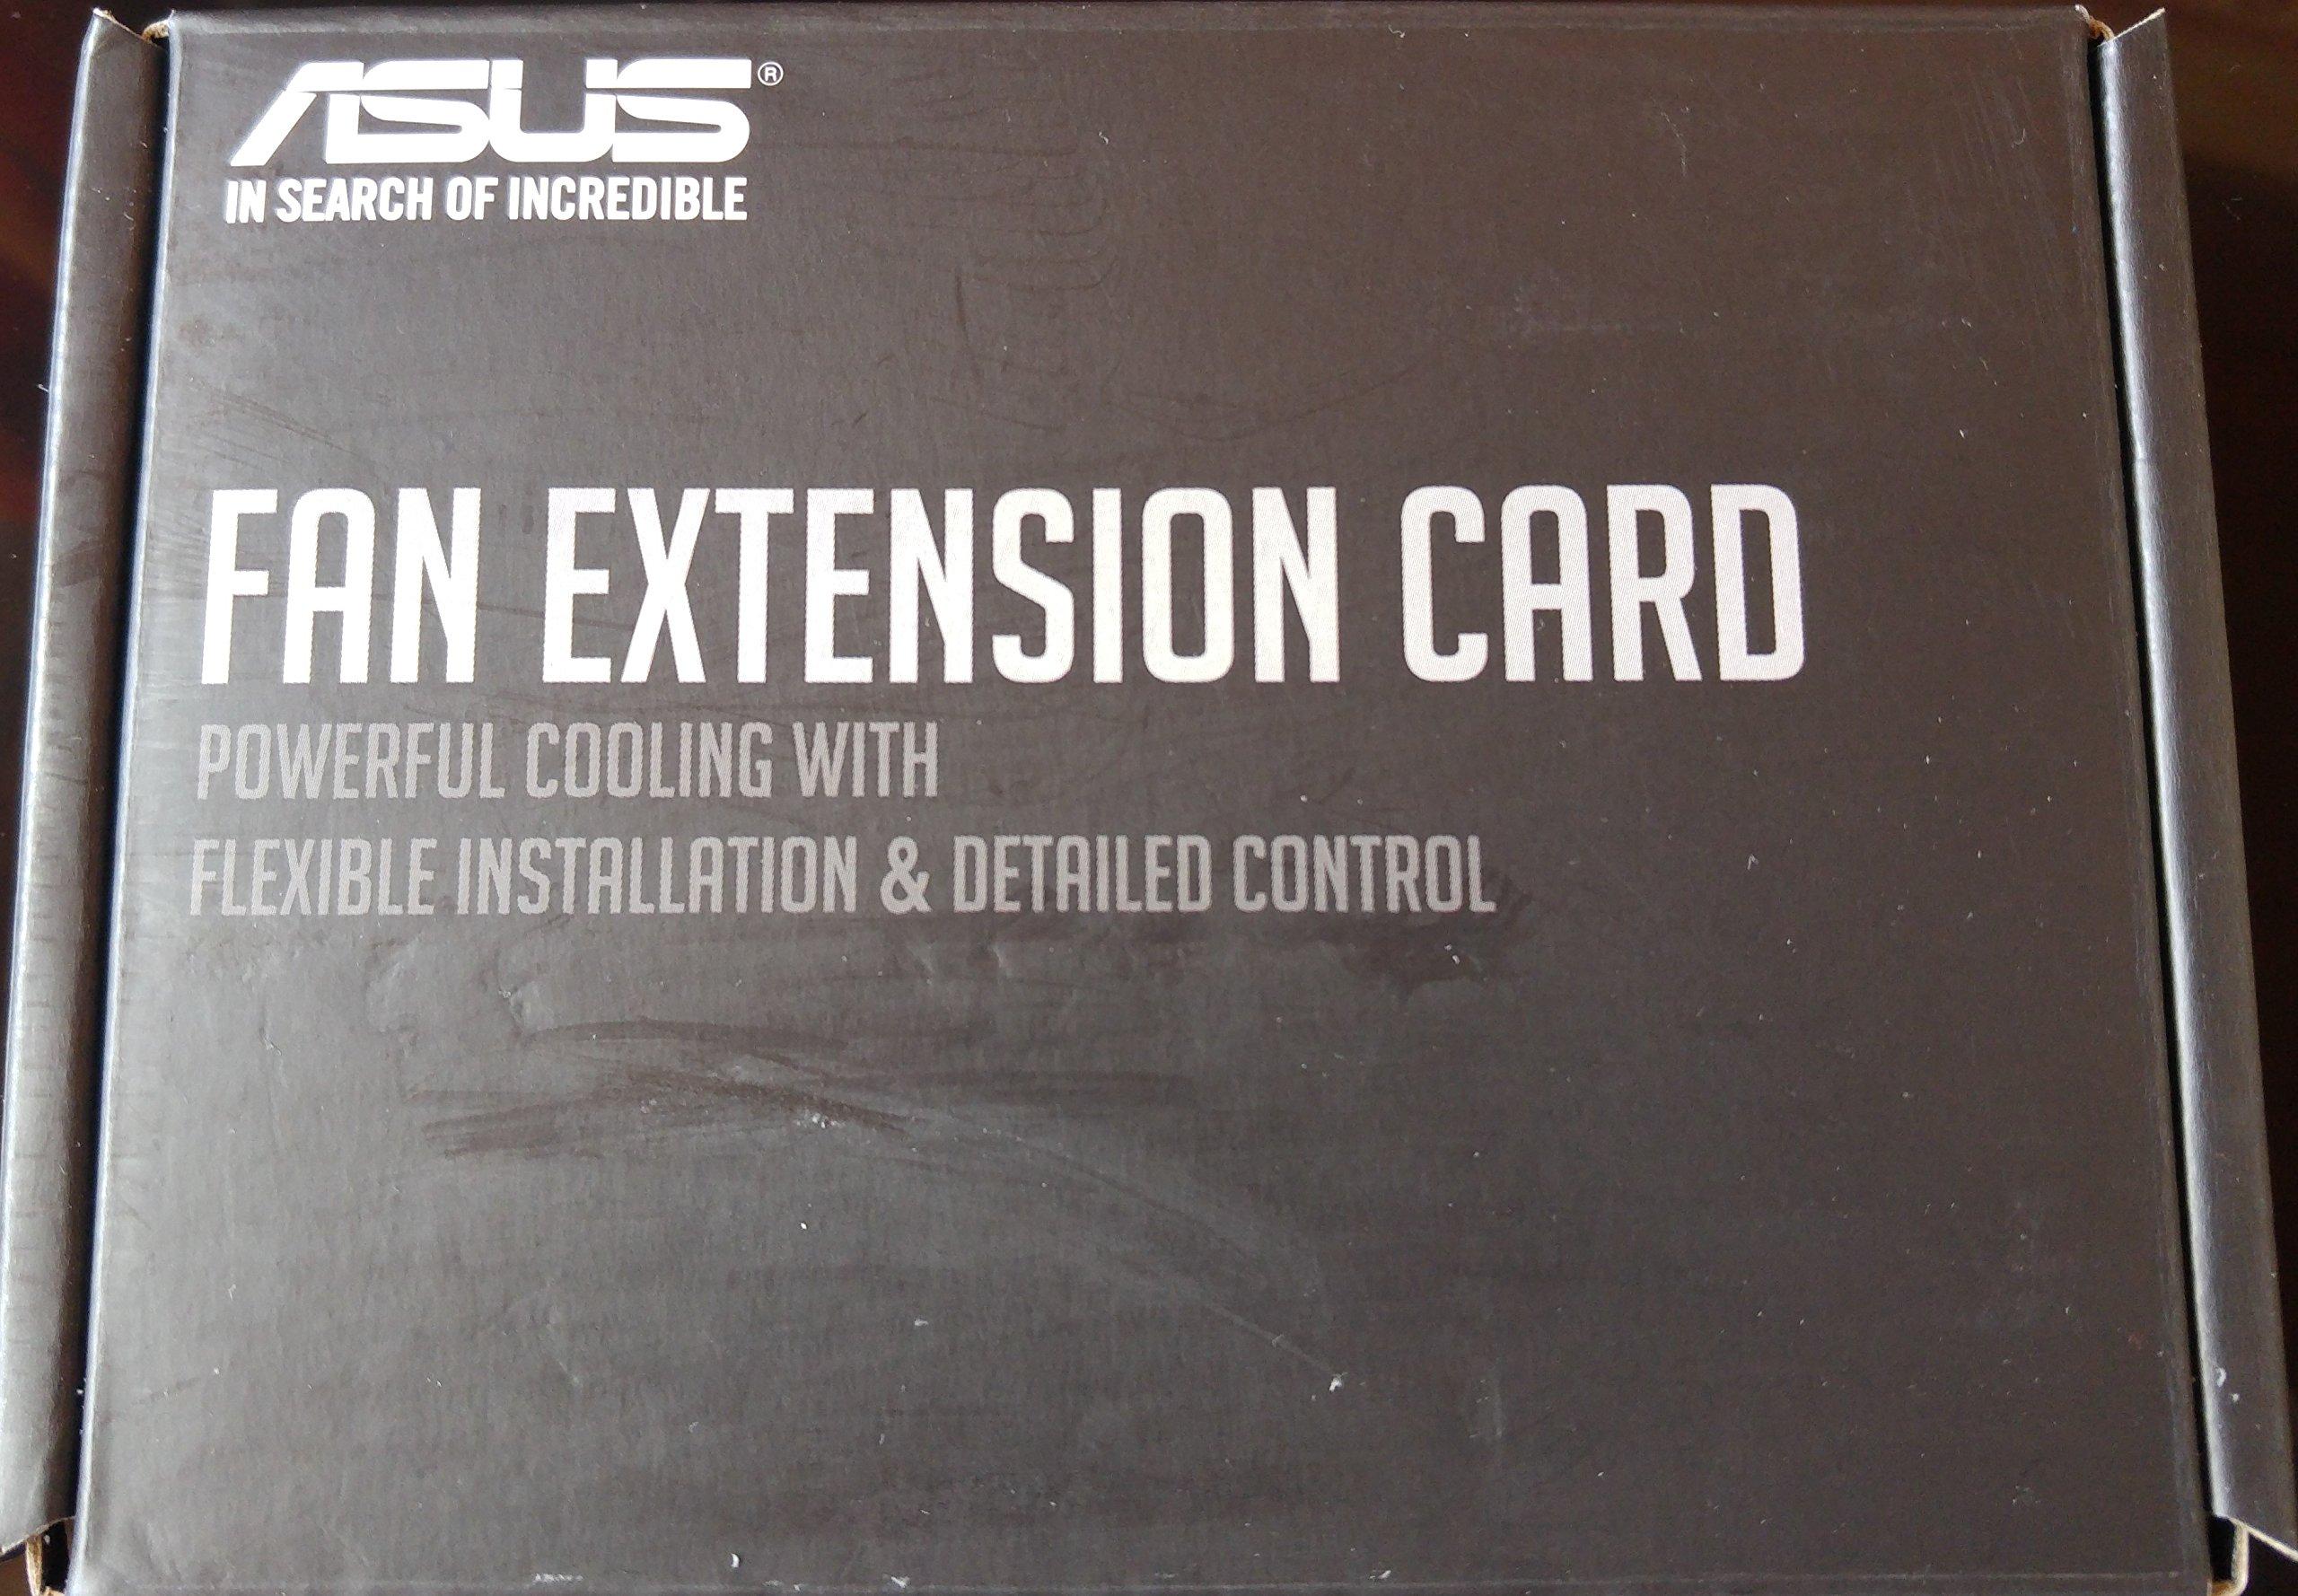 ASUS Asustek Motherboard for Optional Fan for Connecting pinhedda- Upgrade Card Fan Extension Card